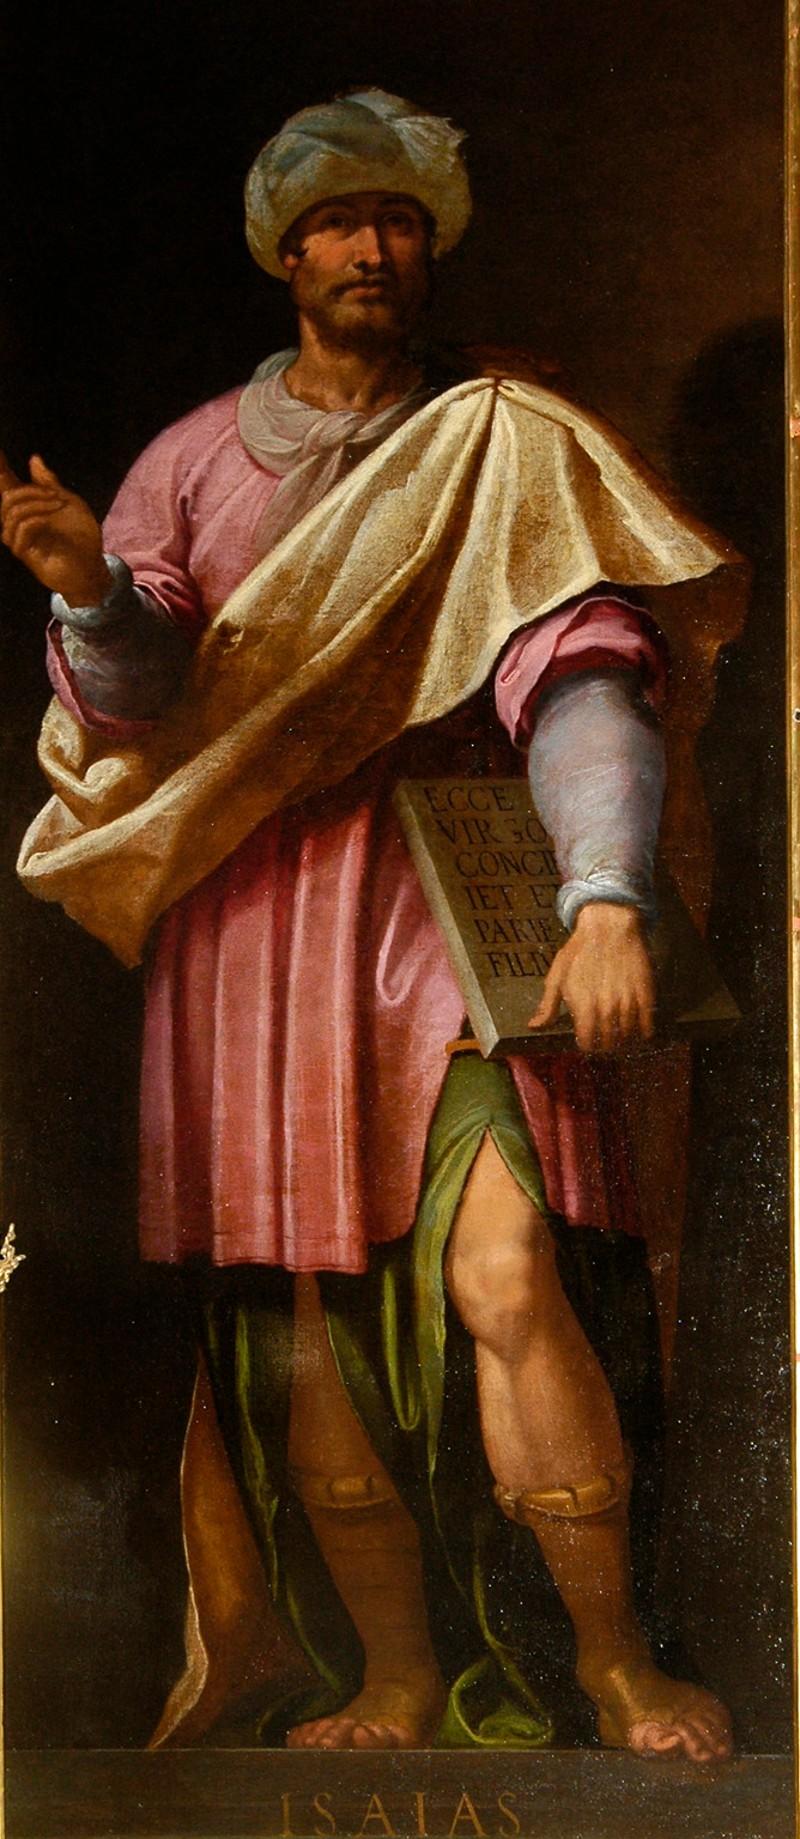 Castello B. sec. XVII, Il profeta Isaia